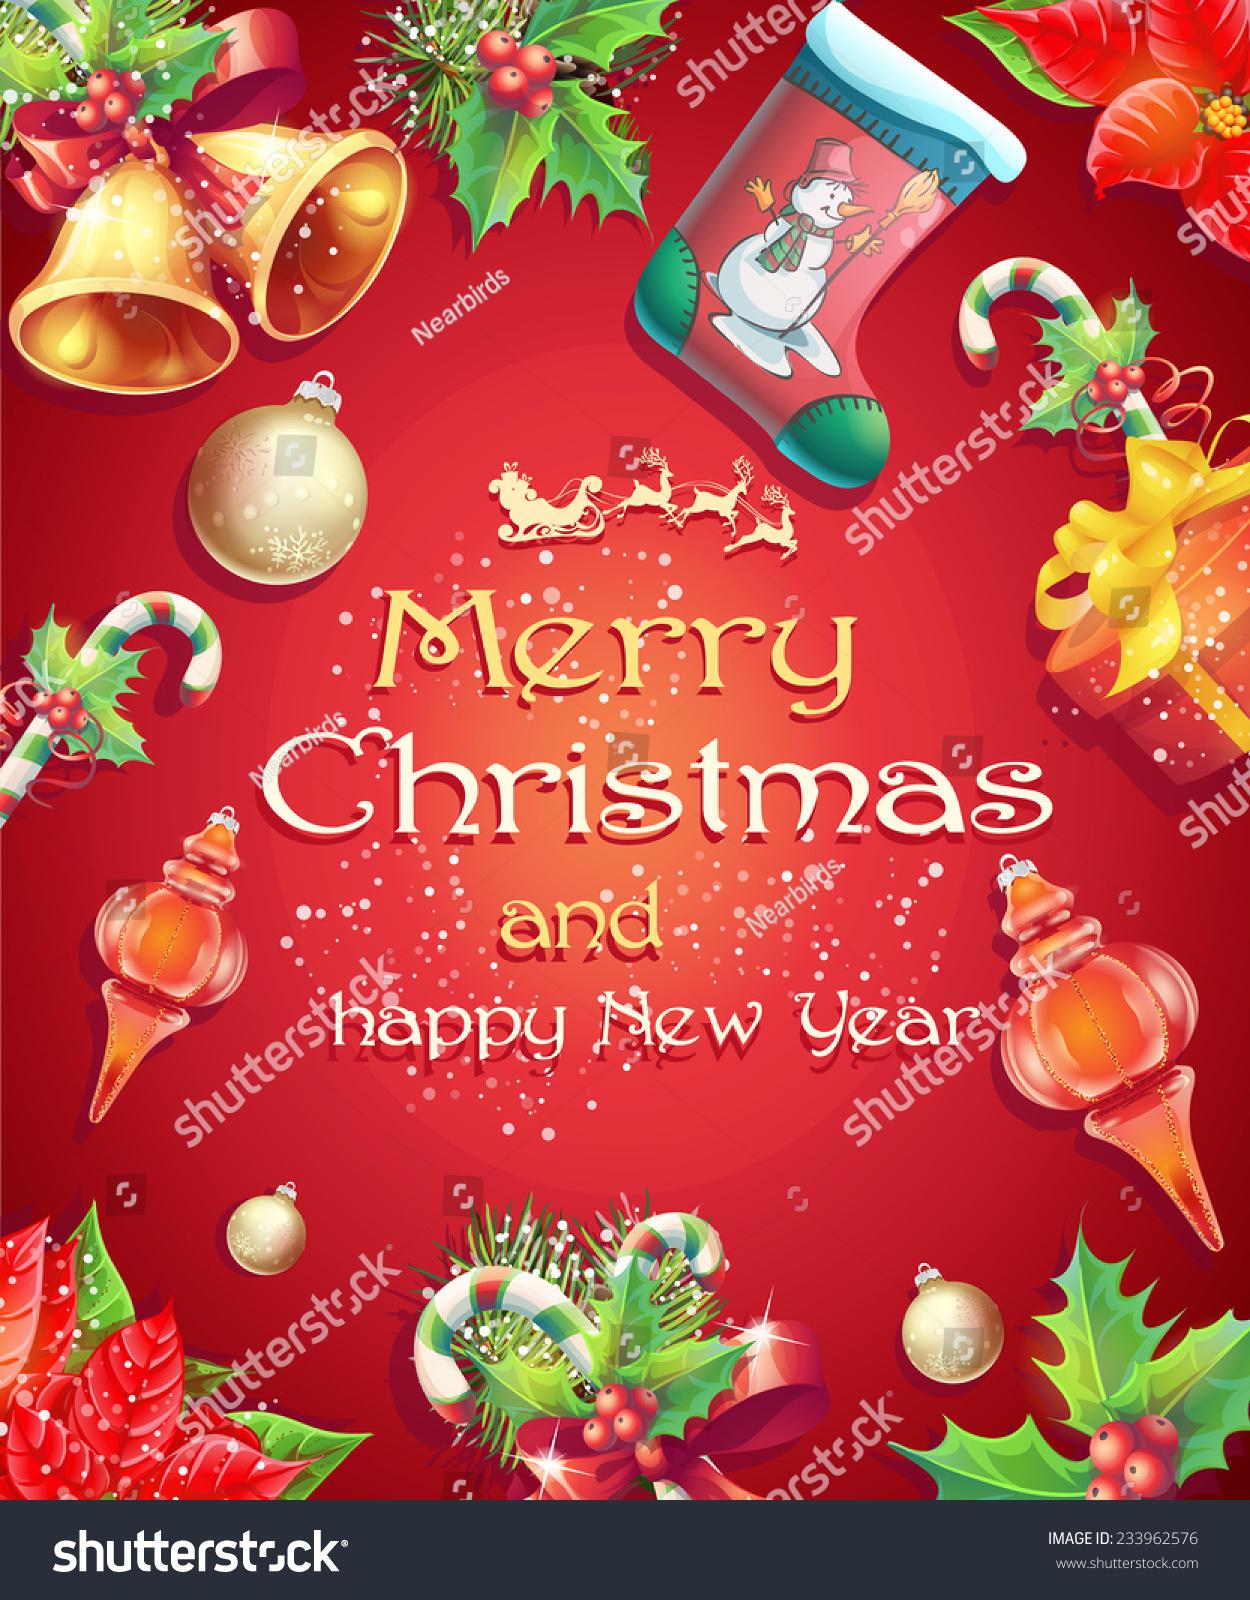 Greeting Card Christmas New Year Image Stock Vector Royalty Free